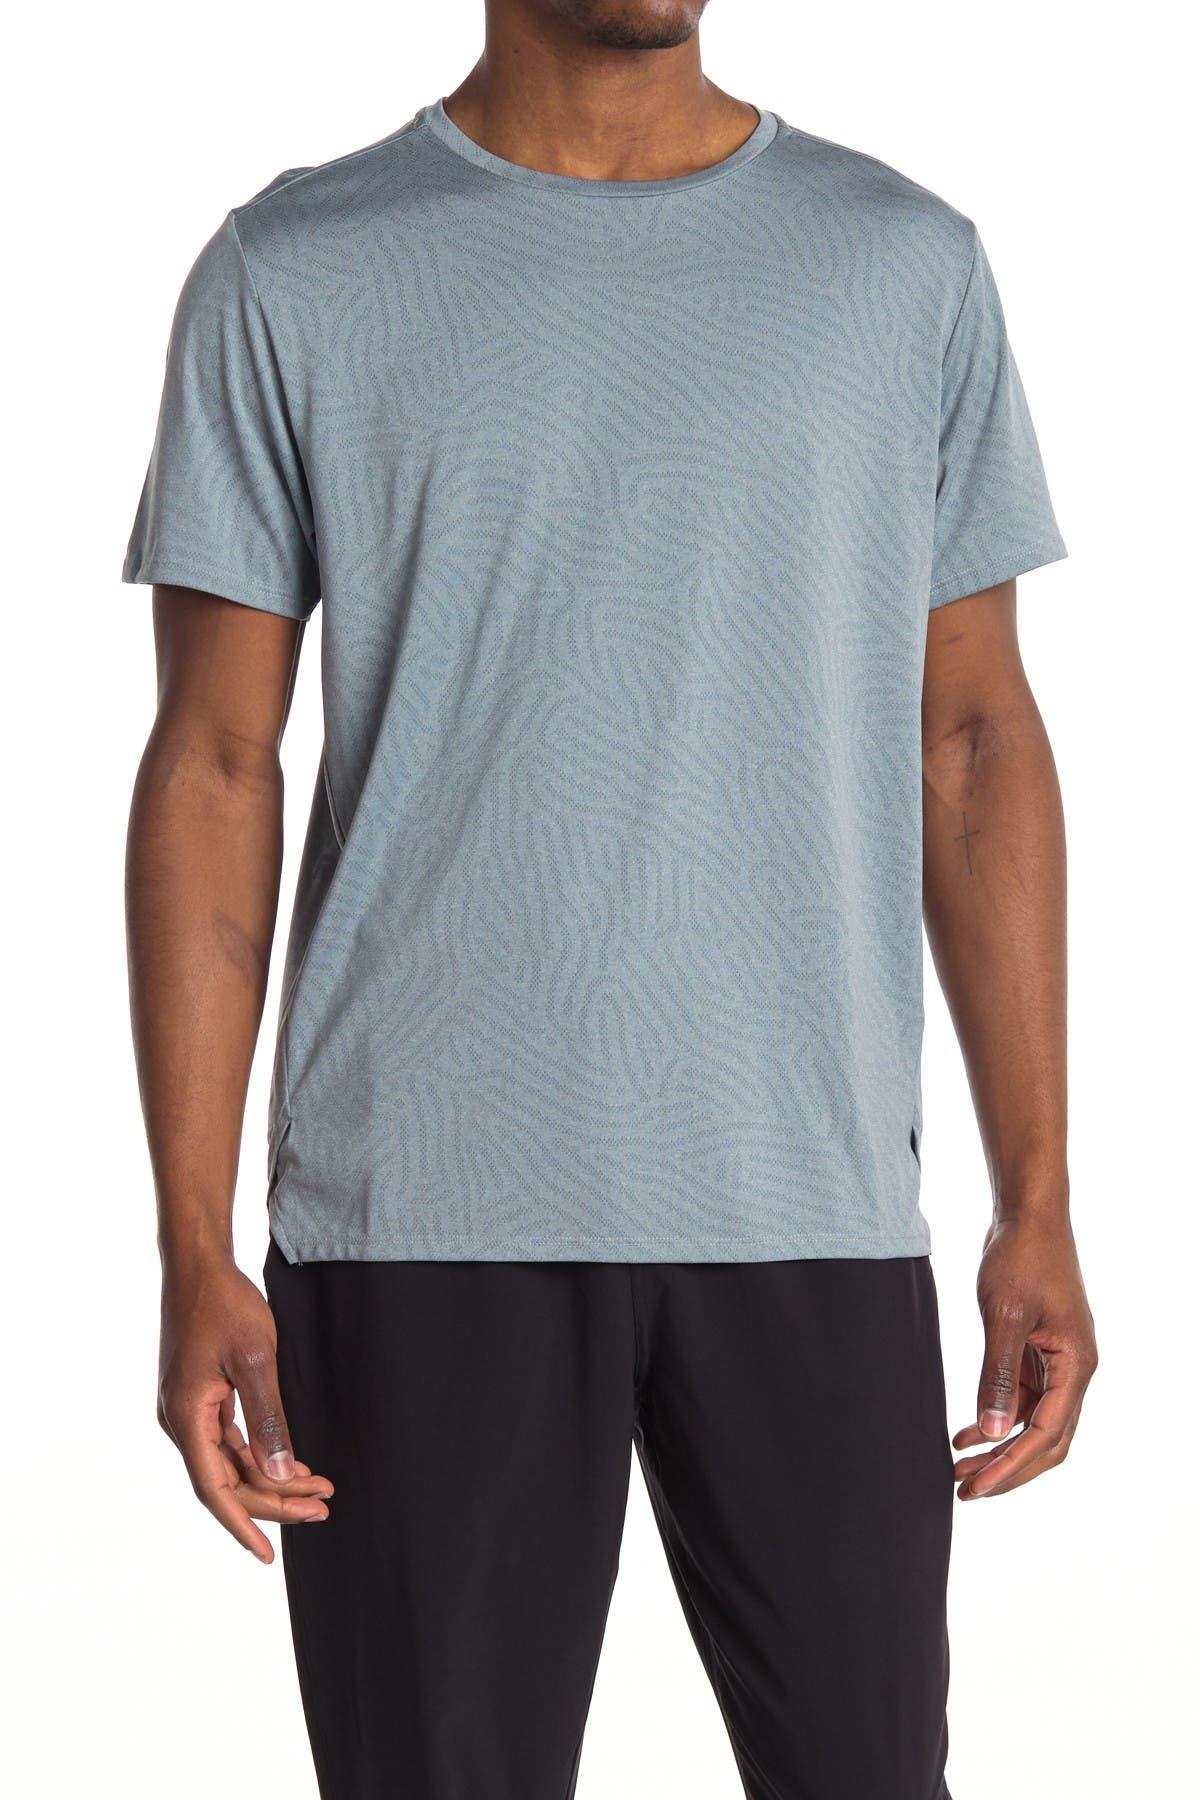 Image of New Balance Q Speed Fuel Jacquard T-Shirt